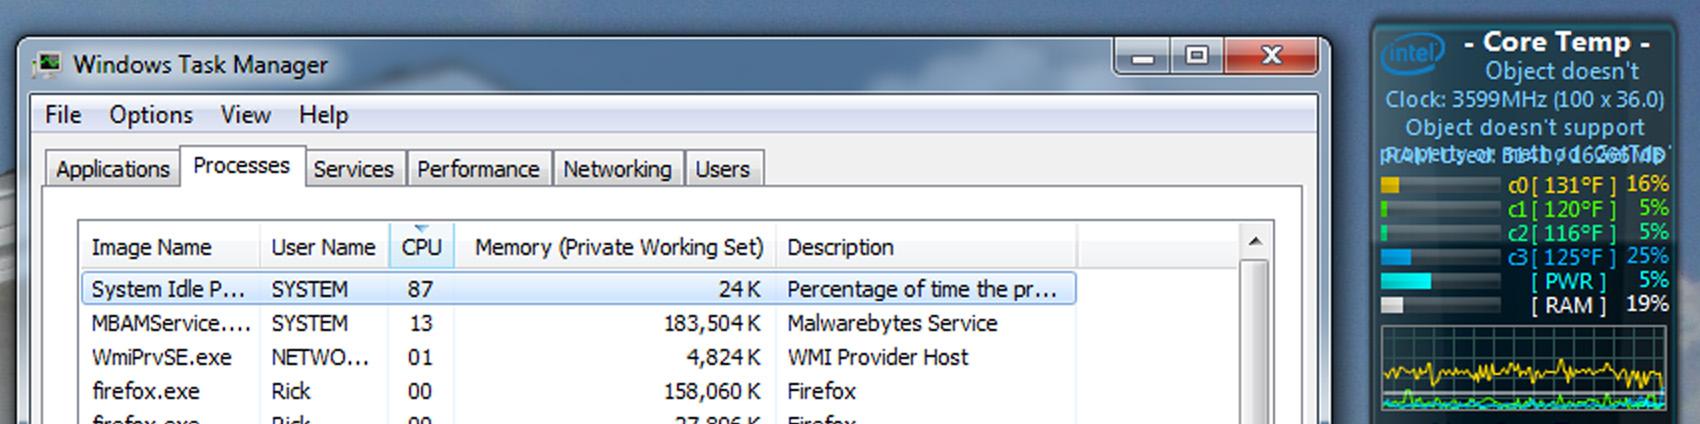 malwarebytes 100 cpu usage